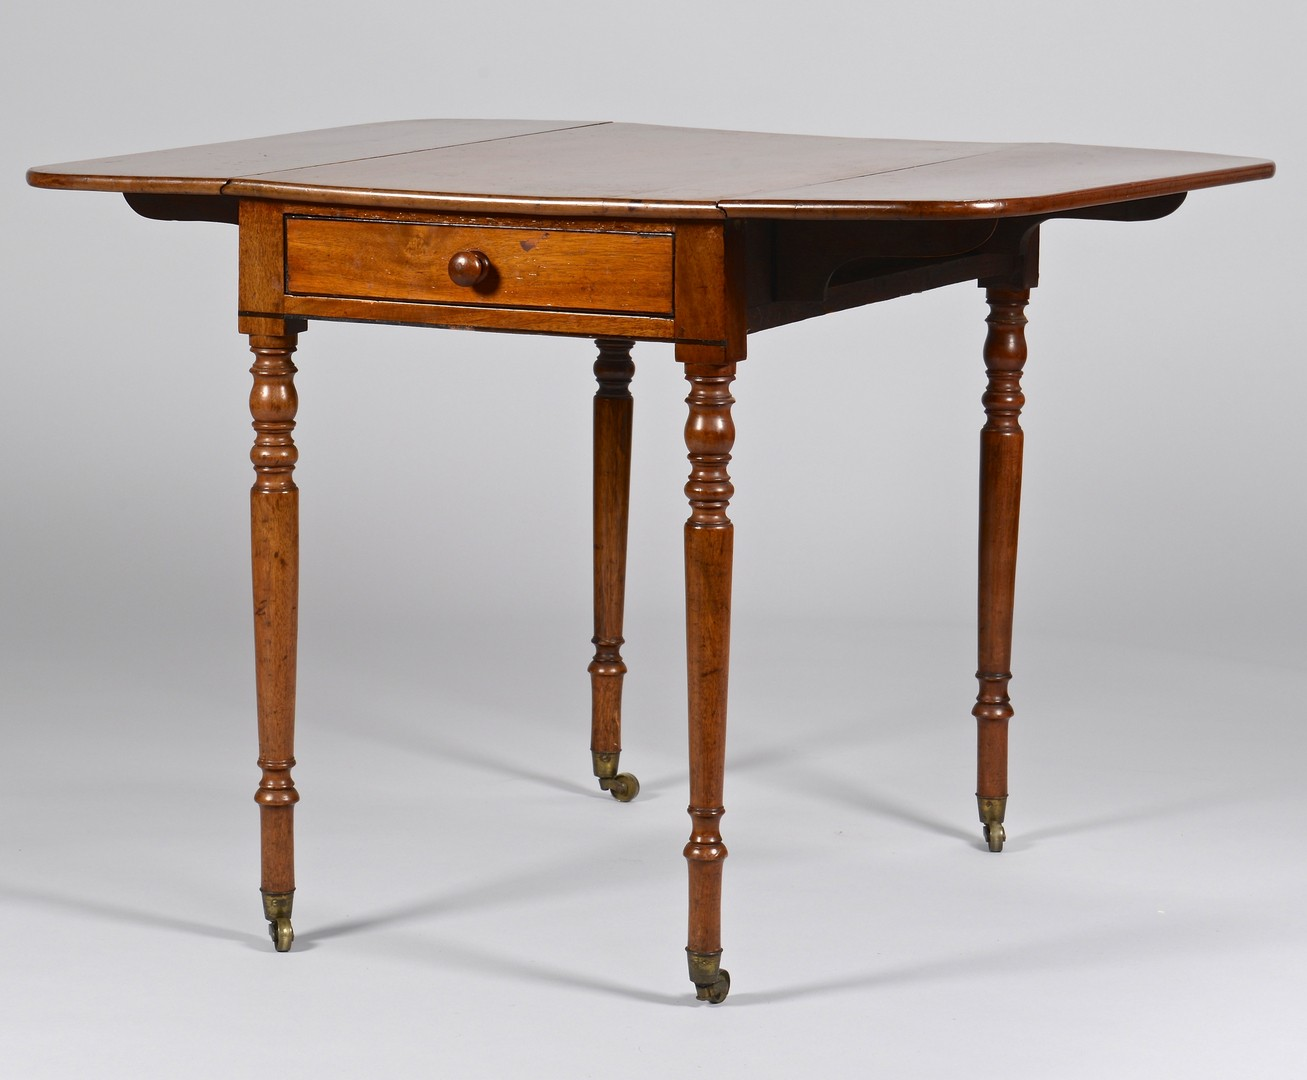 Lot 102: Diminutive Sheraton Mahogany Pembroke Table